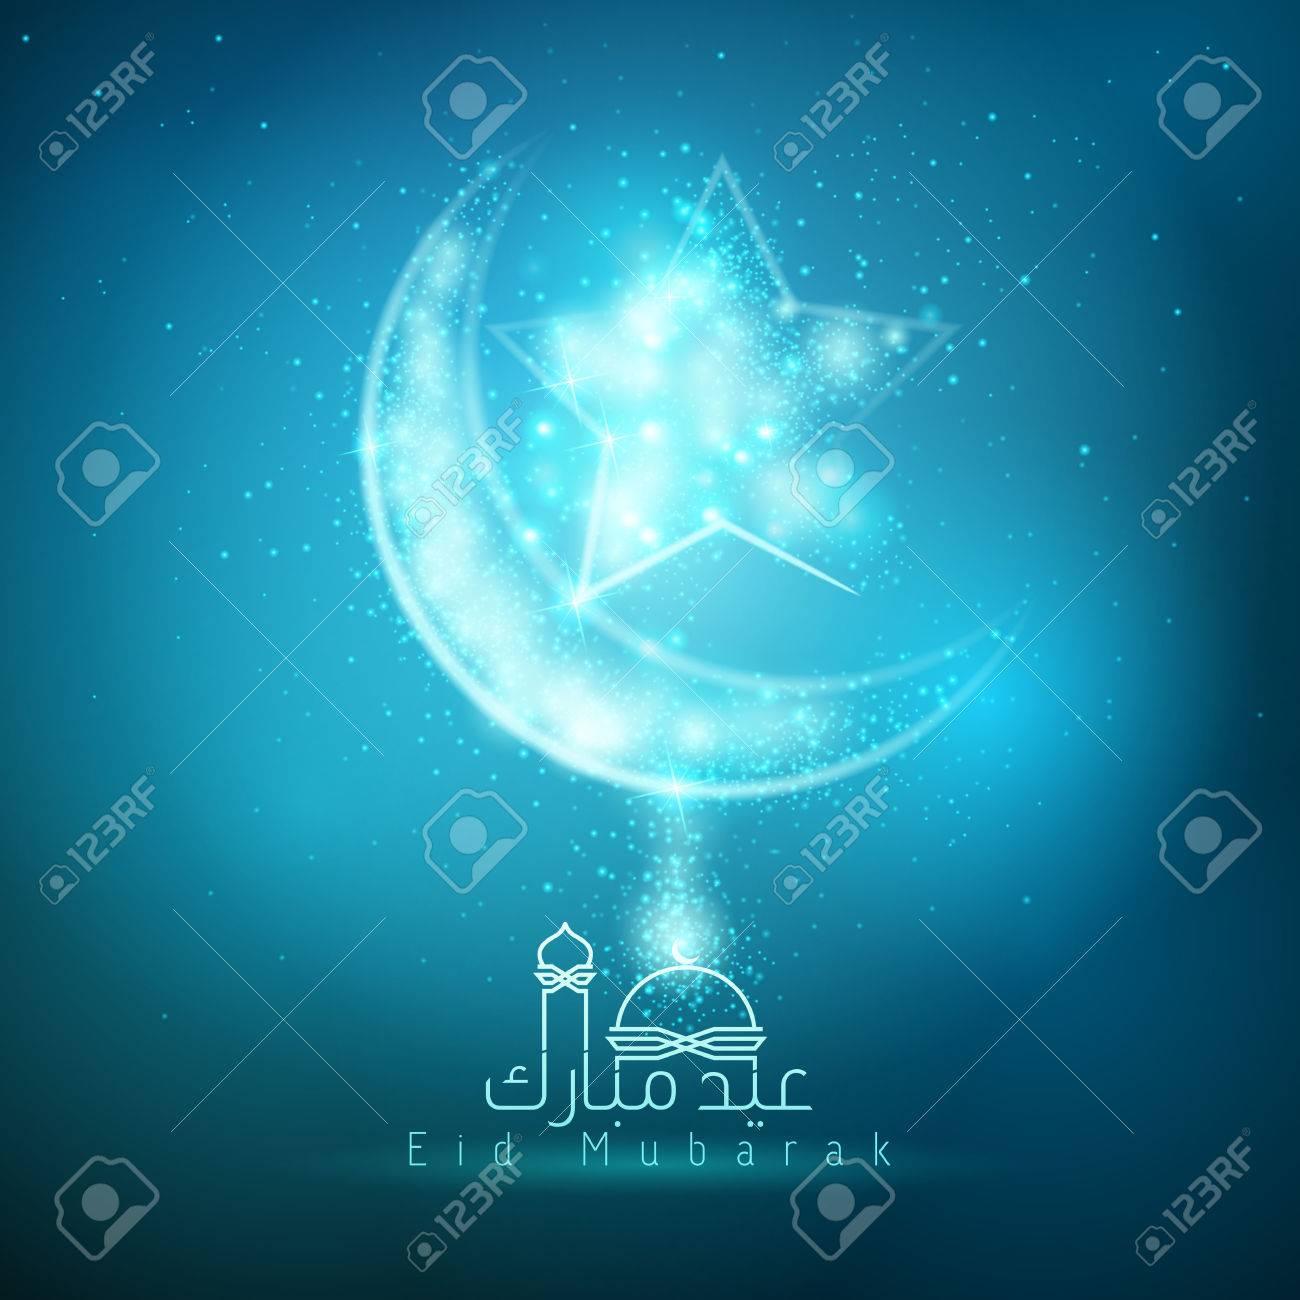 Eid mubarak arabic calligraphy blue glow light islamic crescent eid mubarak arabic calligraphy blue glow light islamic crescent and star stock vector 56801261 m4hsunfo